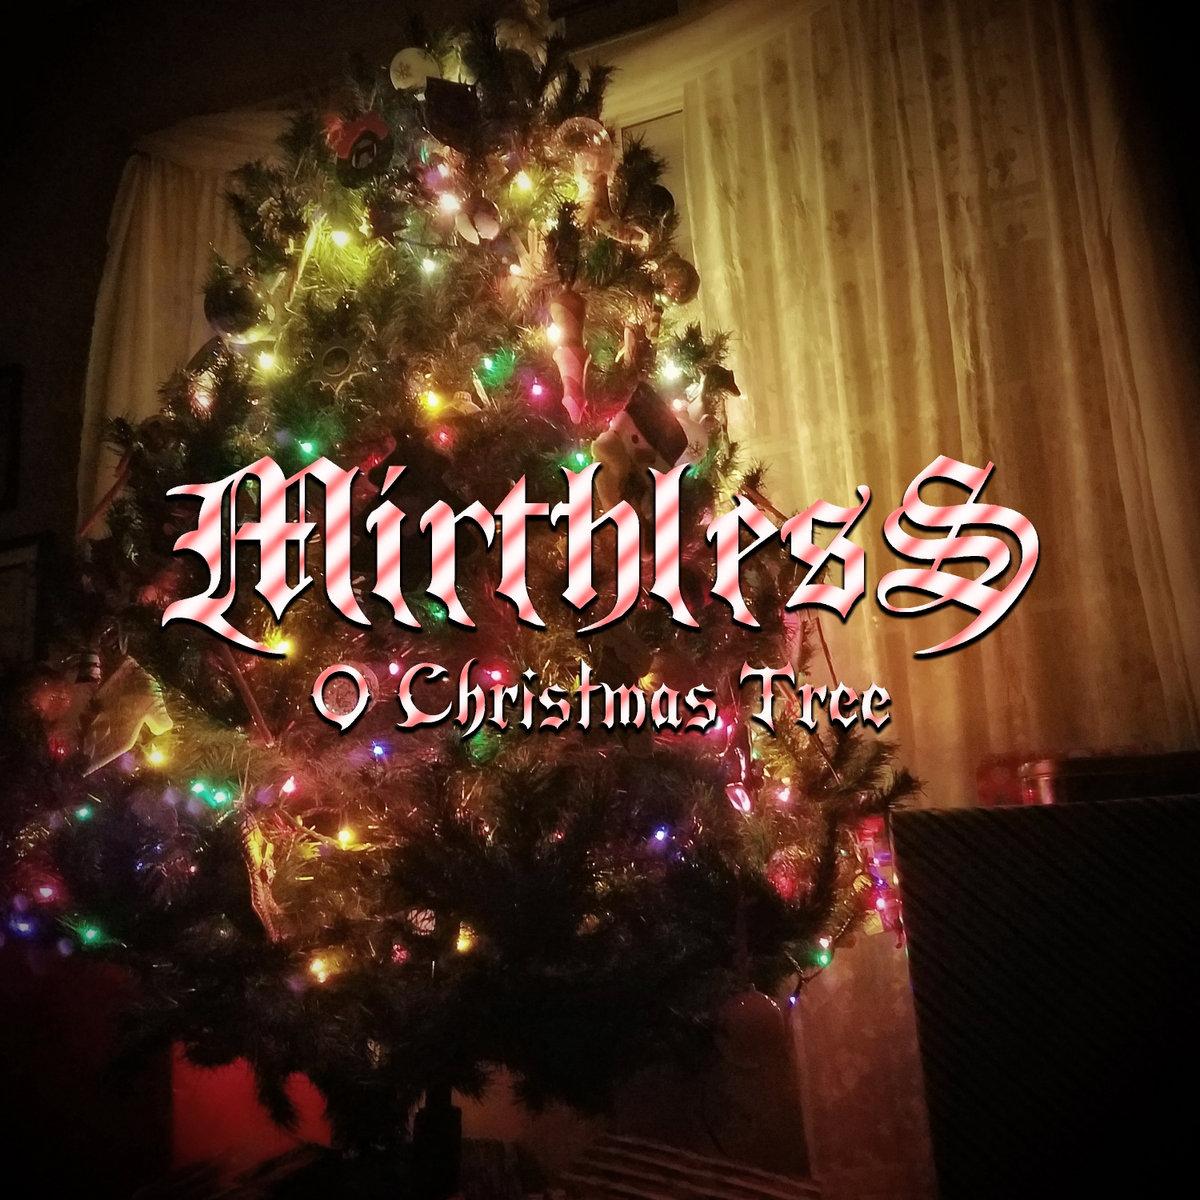 O Christmas Tree | Mirthless